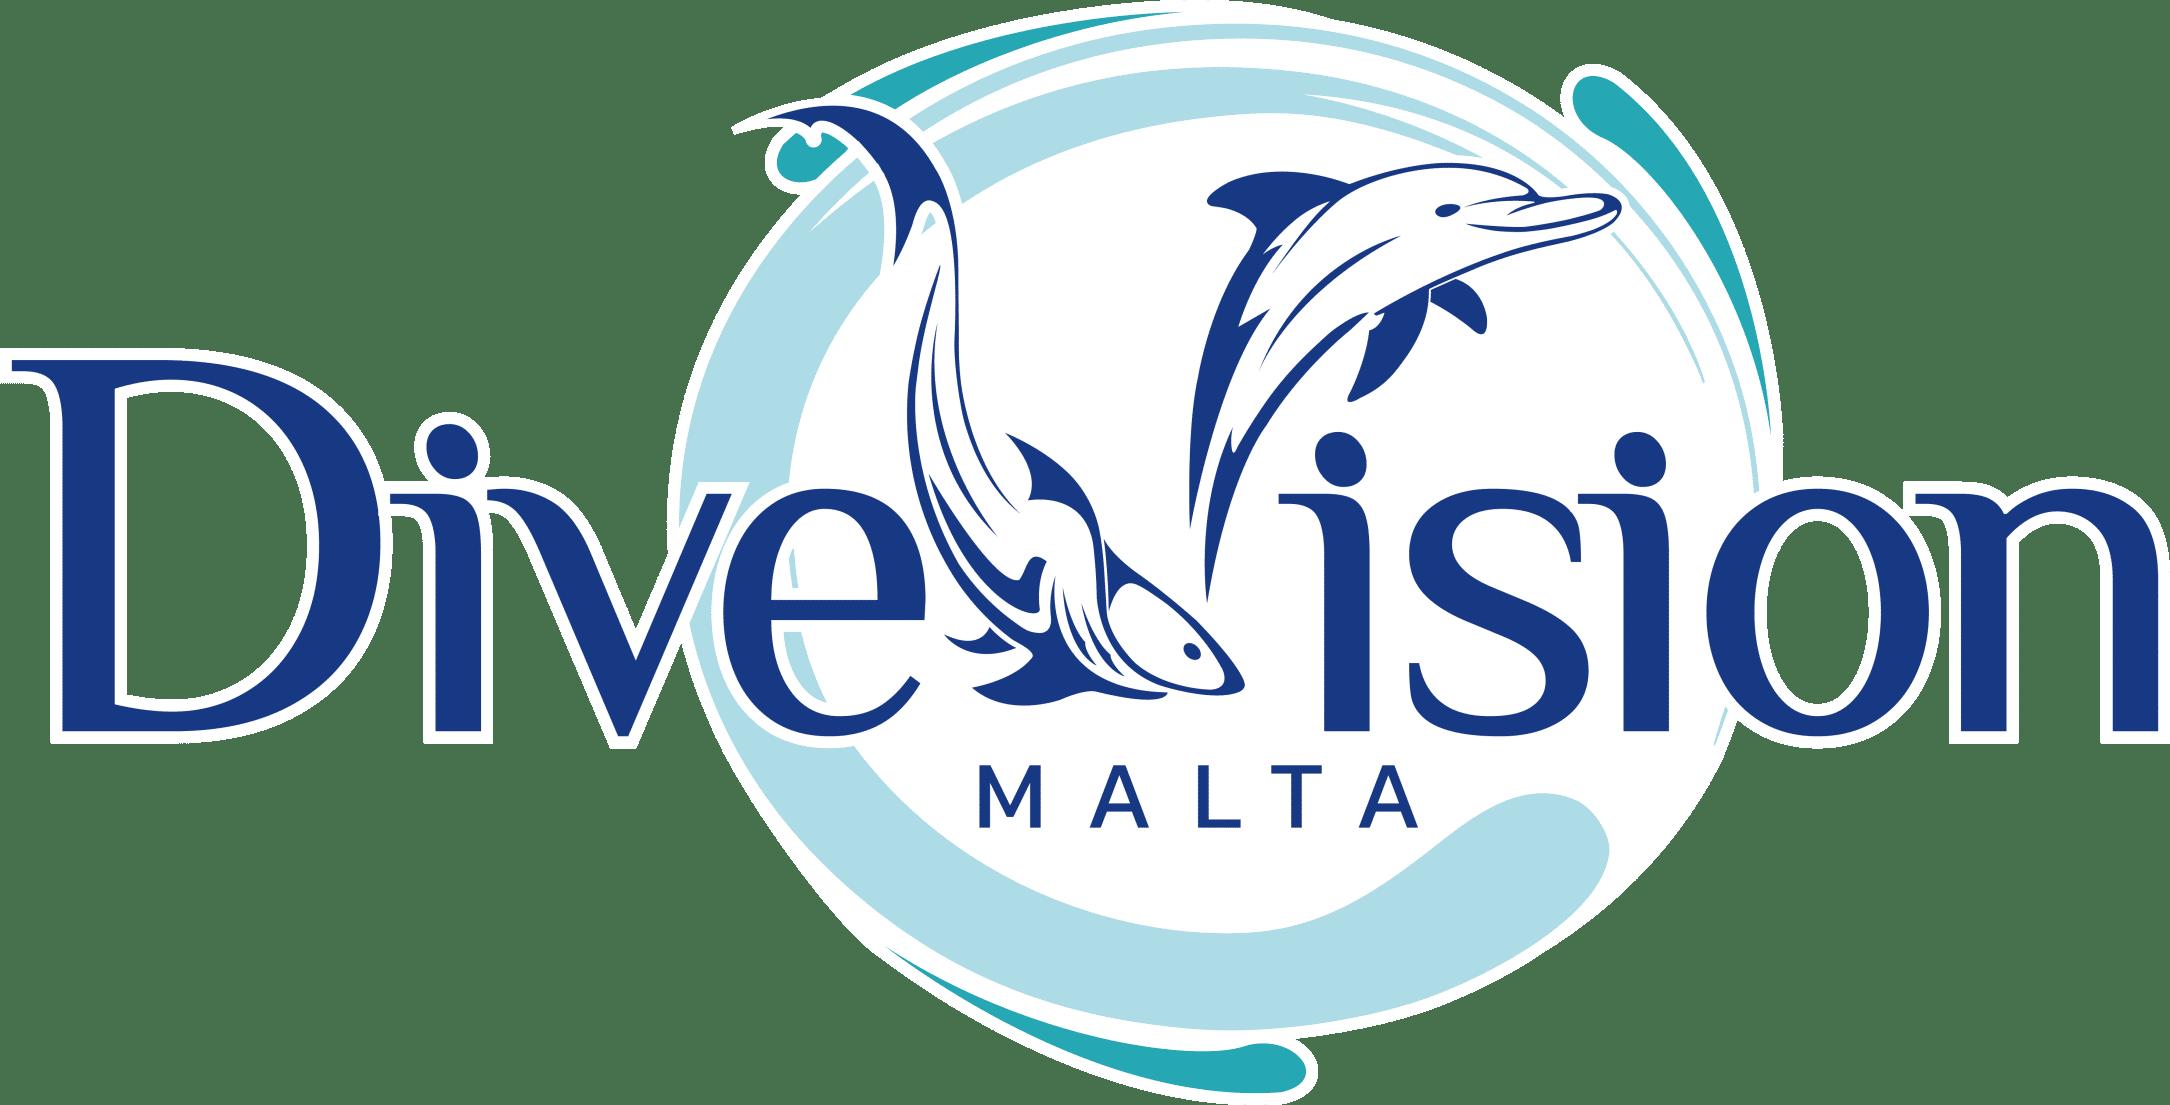 Dive Vision Malta Logo